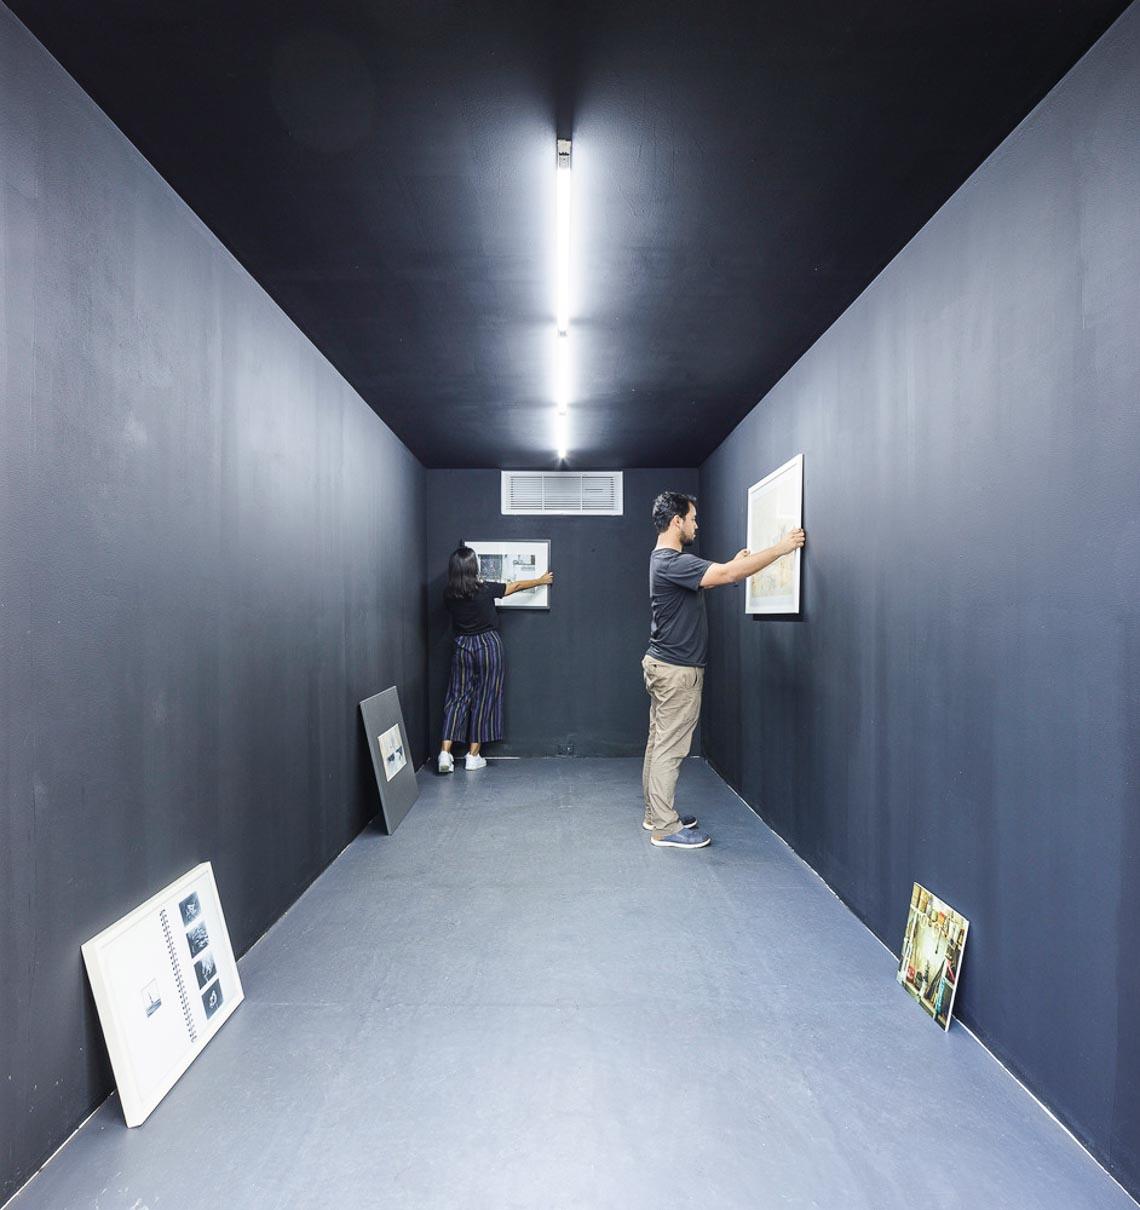 Bảo tàng container ở Panama-16